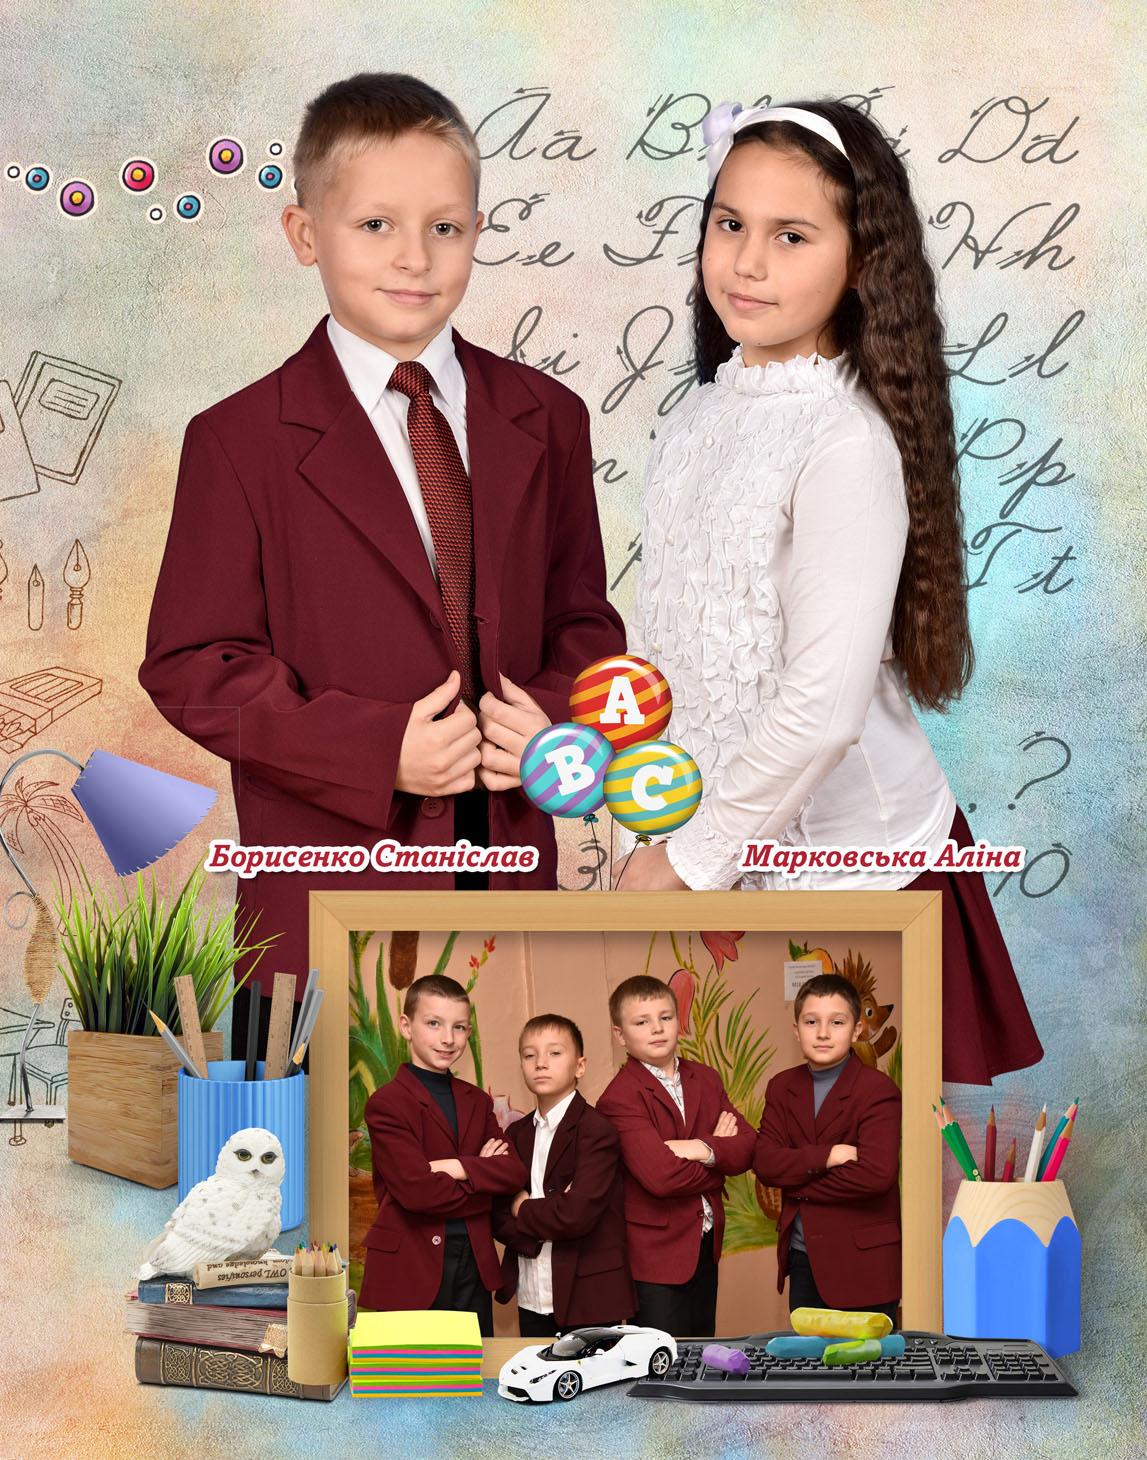 https://school-photo.com.ua/wp-content/uploads/2017/09/07-copy-2.jpg